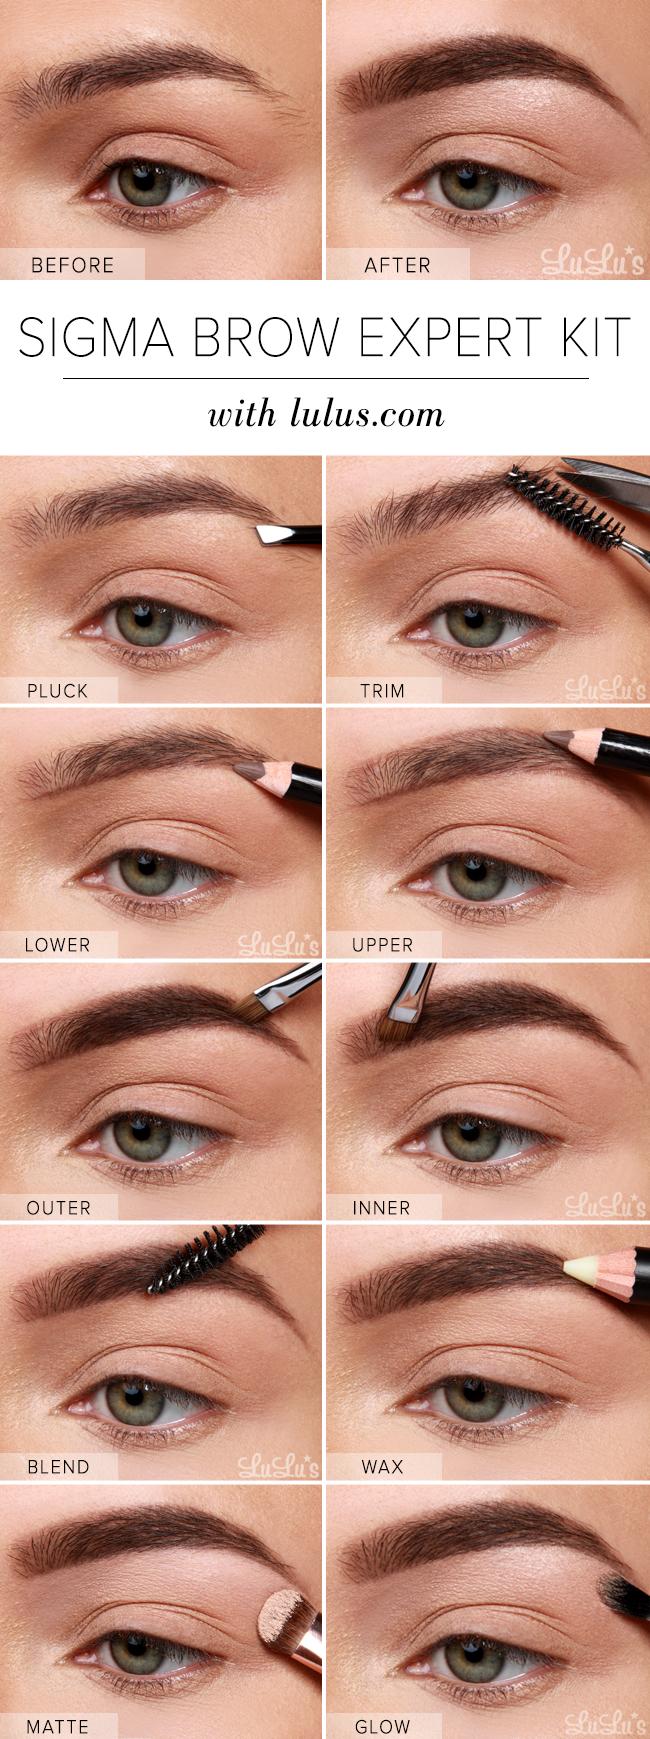 Lulus How To Sigma Brow Expert Kit Eyebrow Tutorial Lulus Com